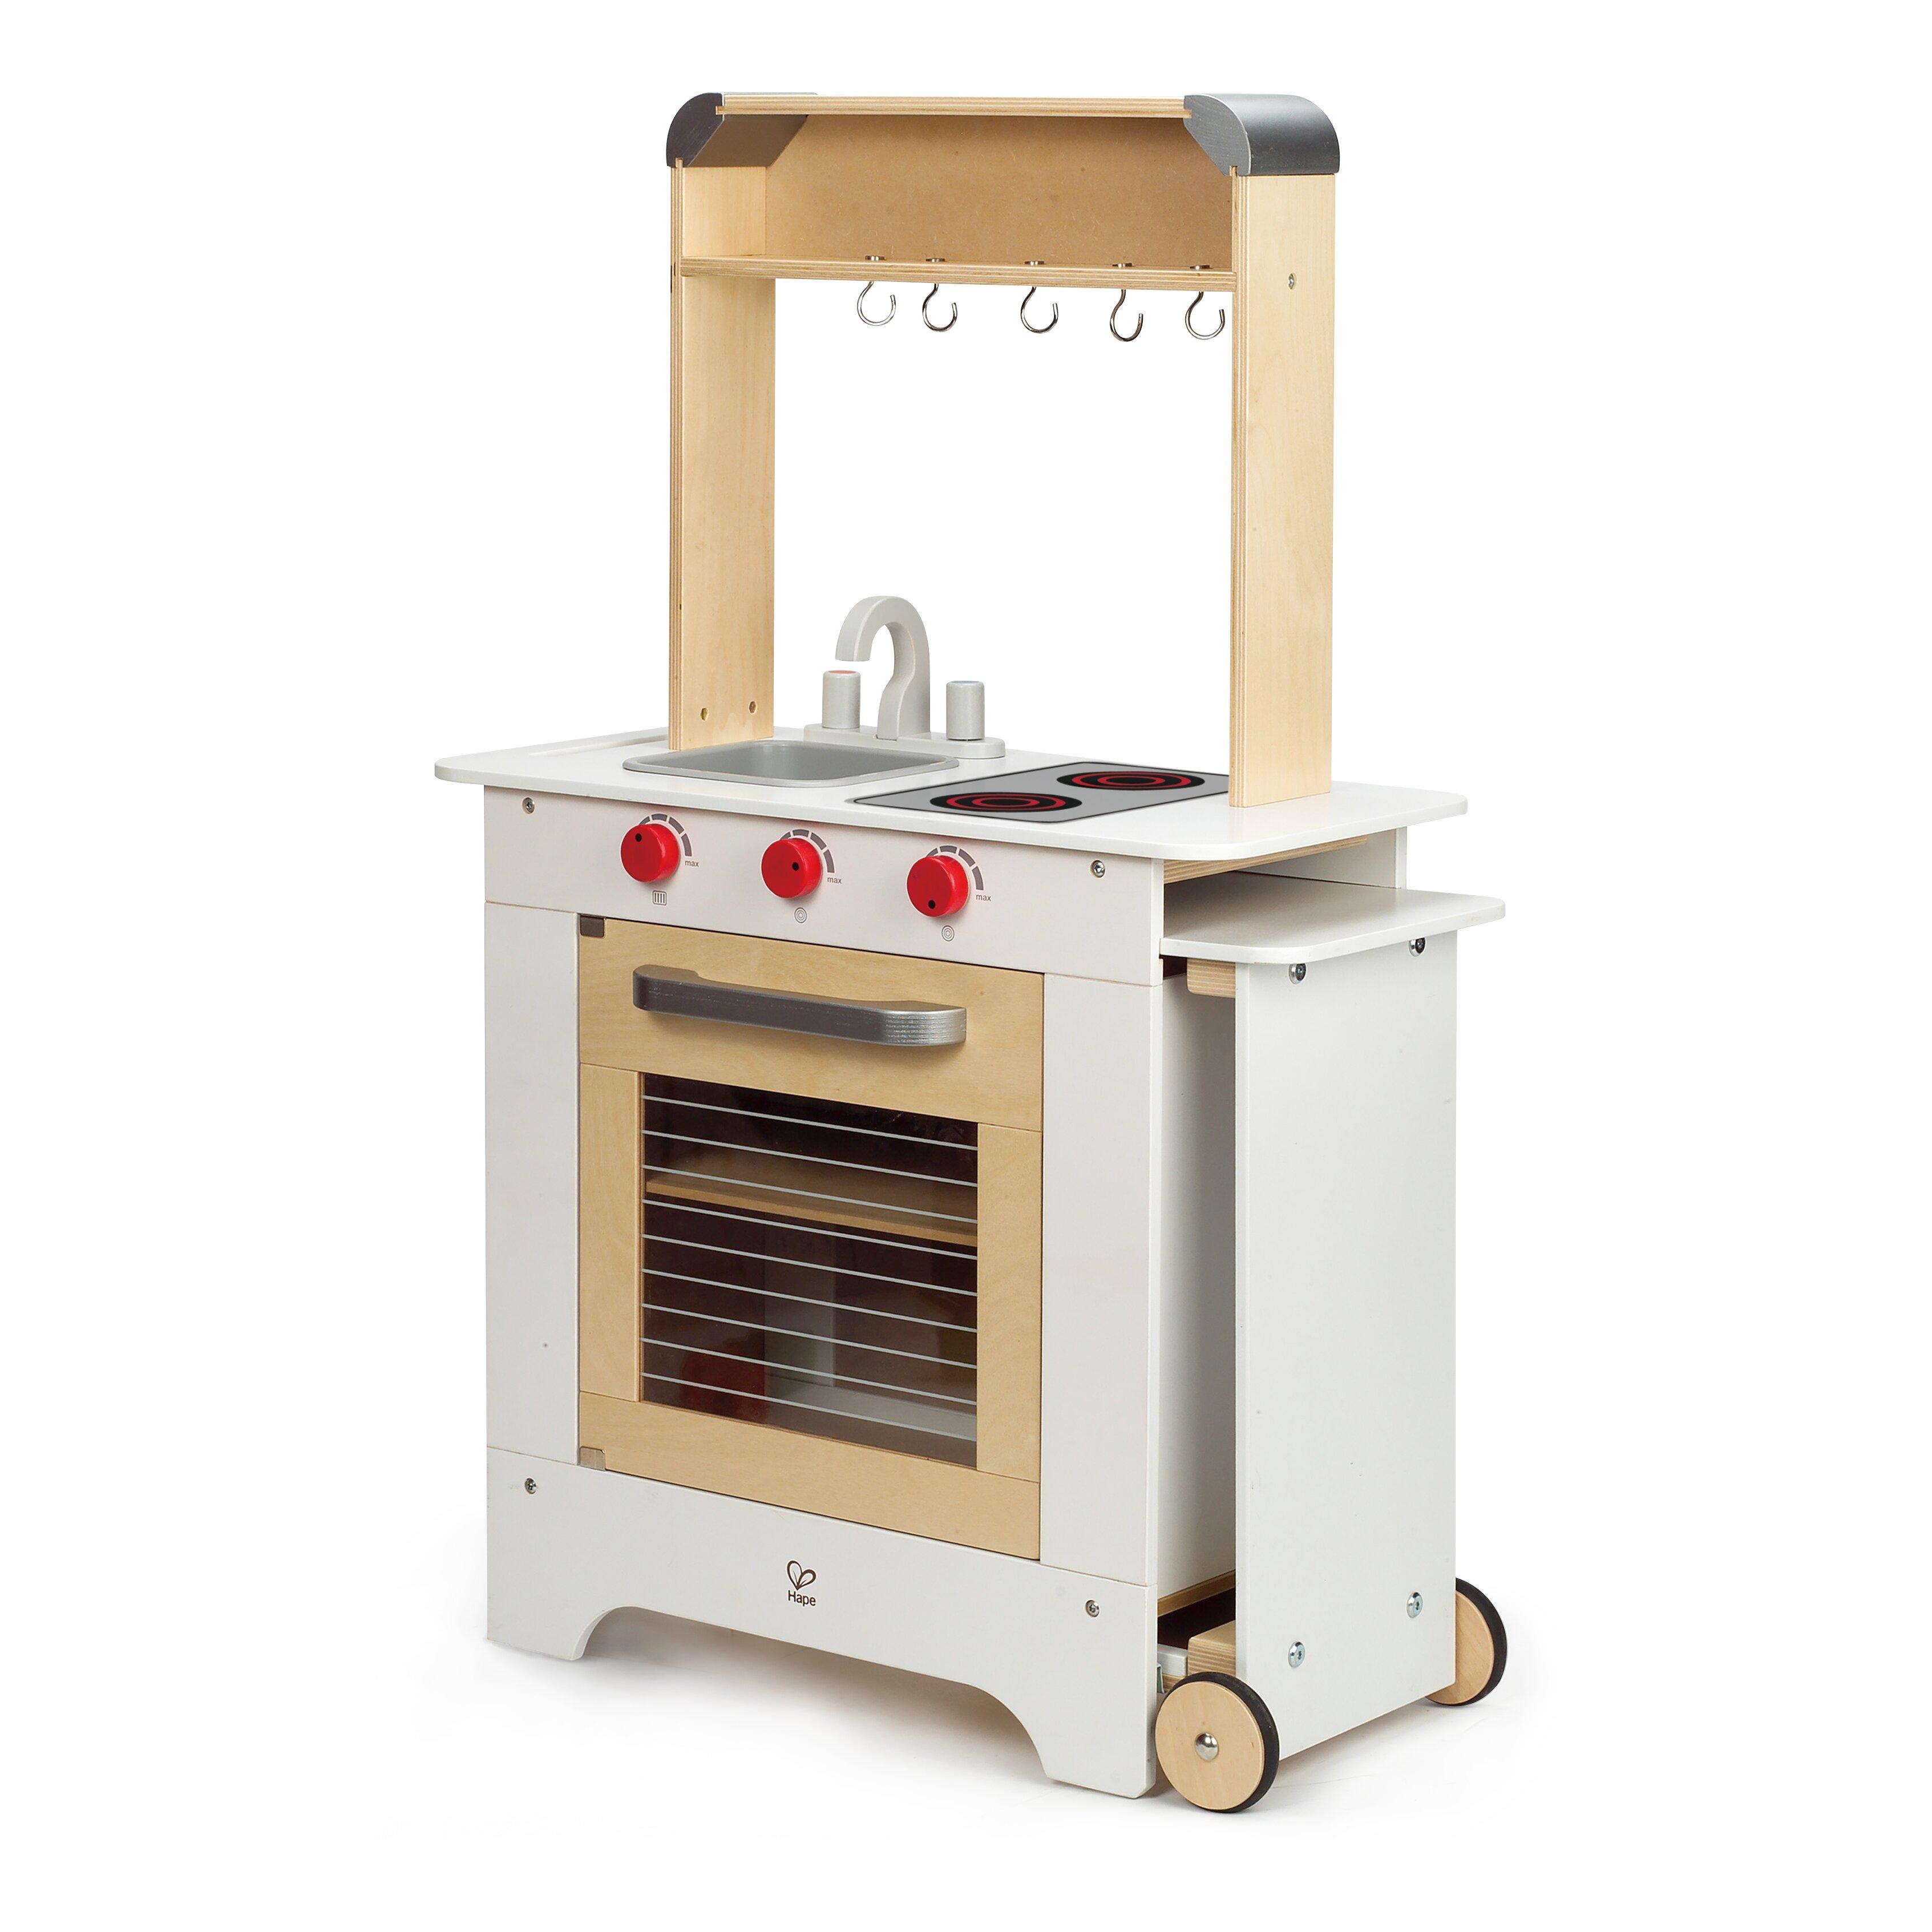 Hape Kitchen: HaPe Playfully Delicious Cook 'n Serve Kitchen & Reviews